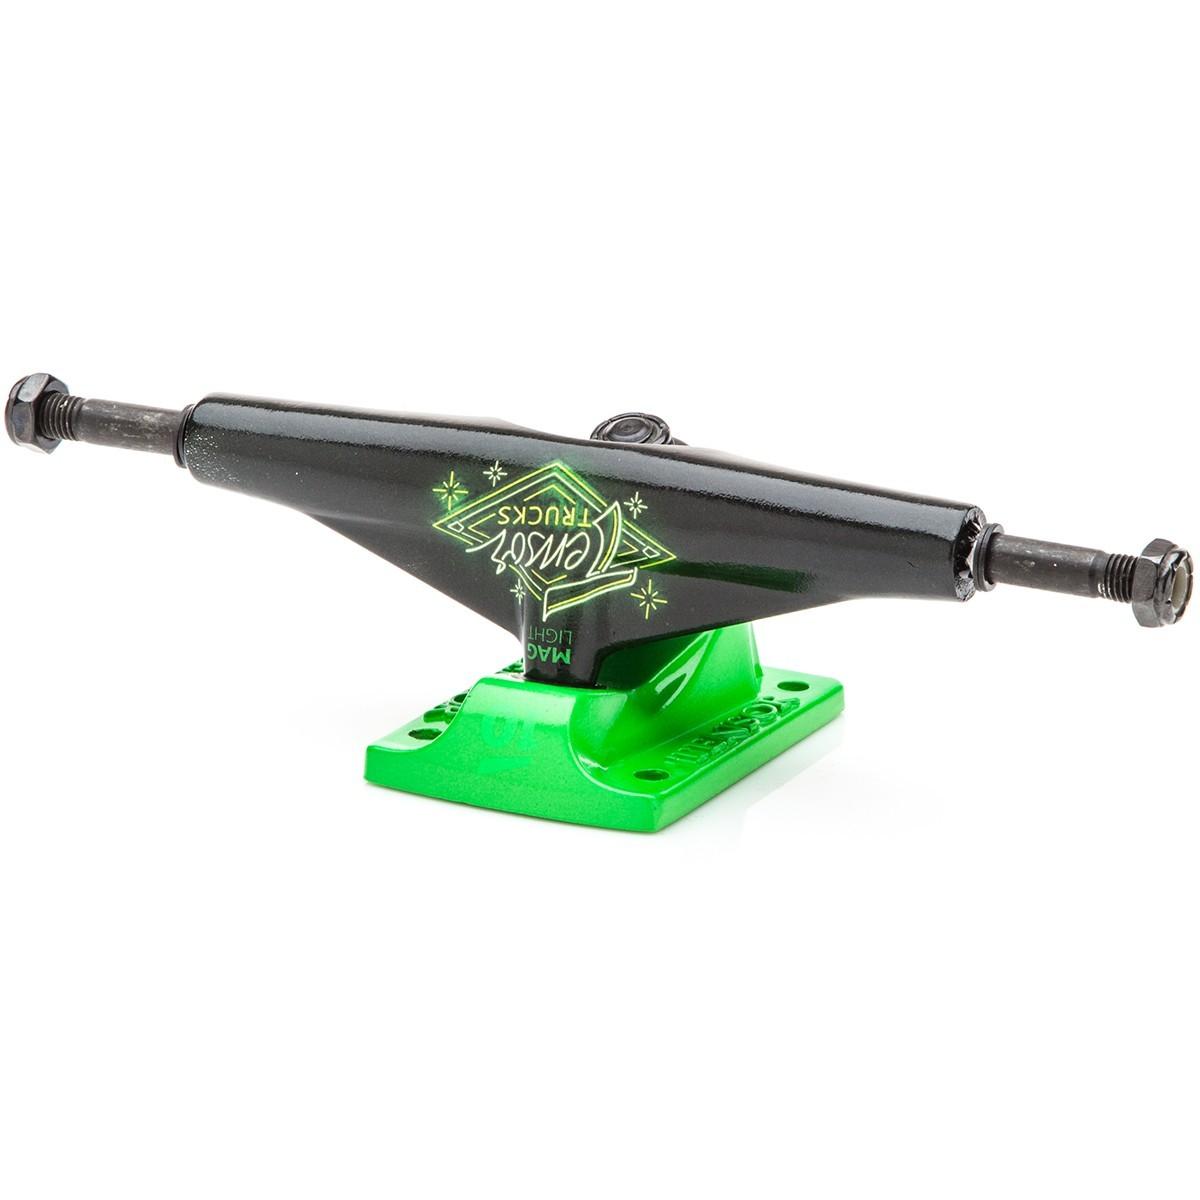 Подвески для скейтборда TENSOR Aluminium Lo Neon Logo (Black/Toxic Green)